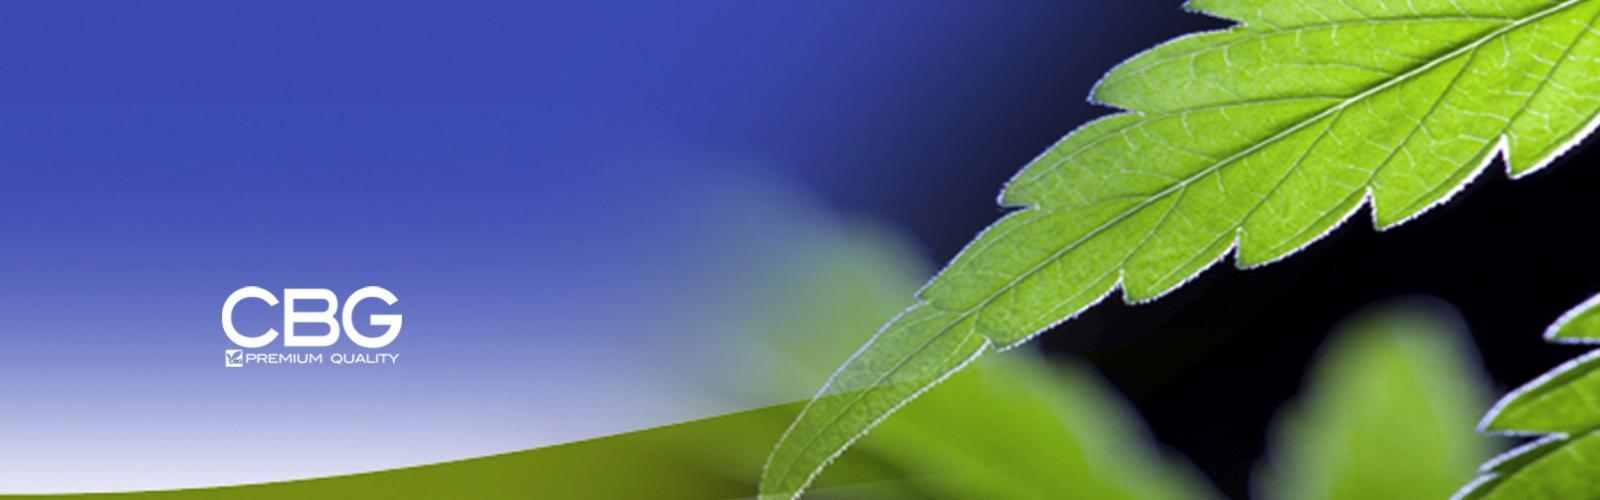 Cannabiogen Cannabis Seeds